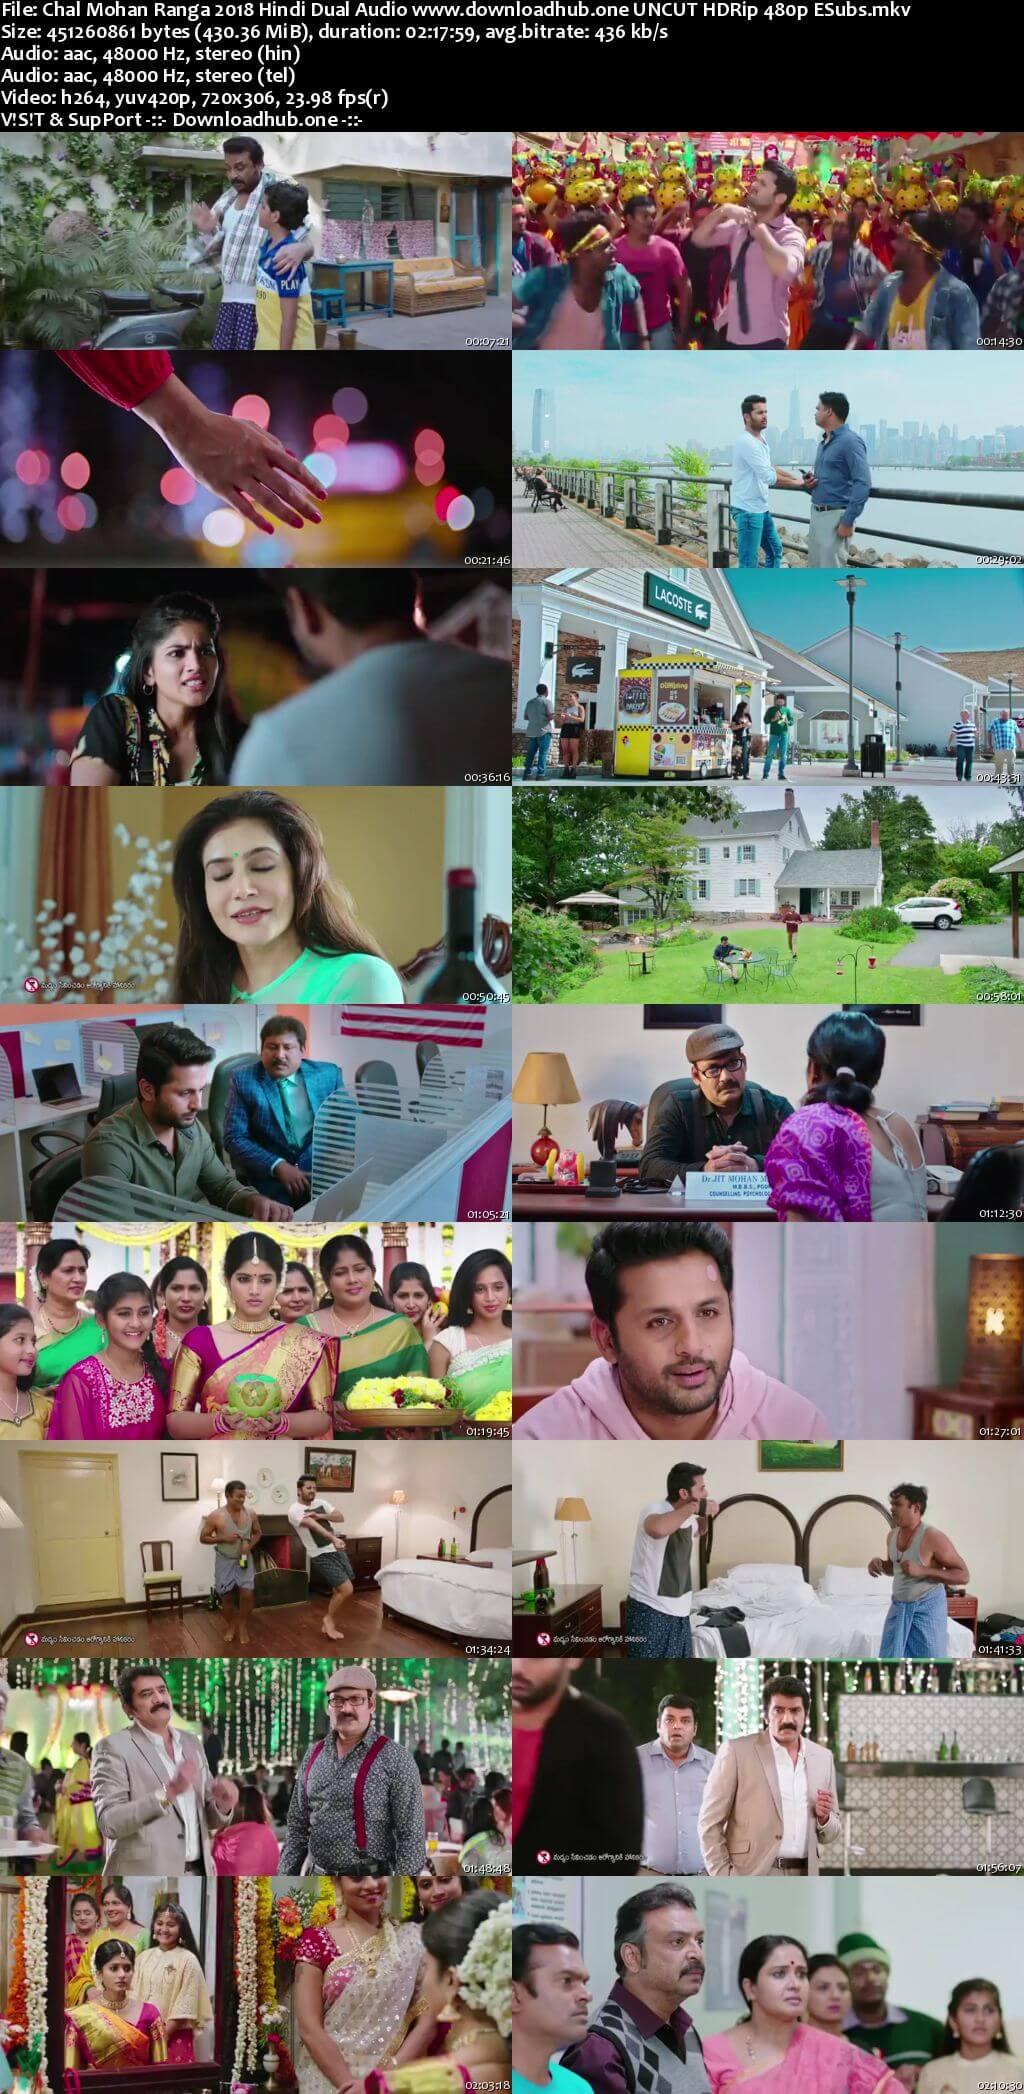 Chal Mohan Ranga 2018 Hindi Dual Audio 400MB UNCUT HDRip 480p ESubs